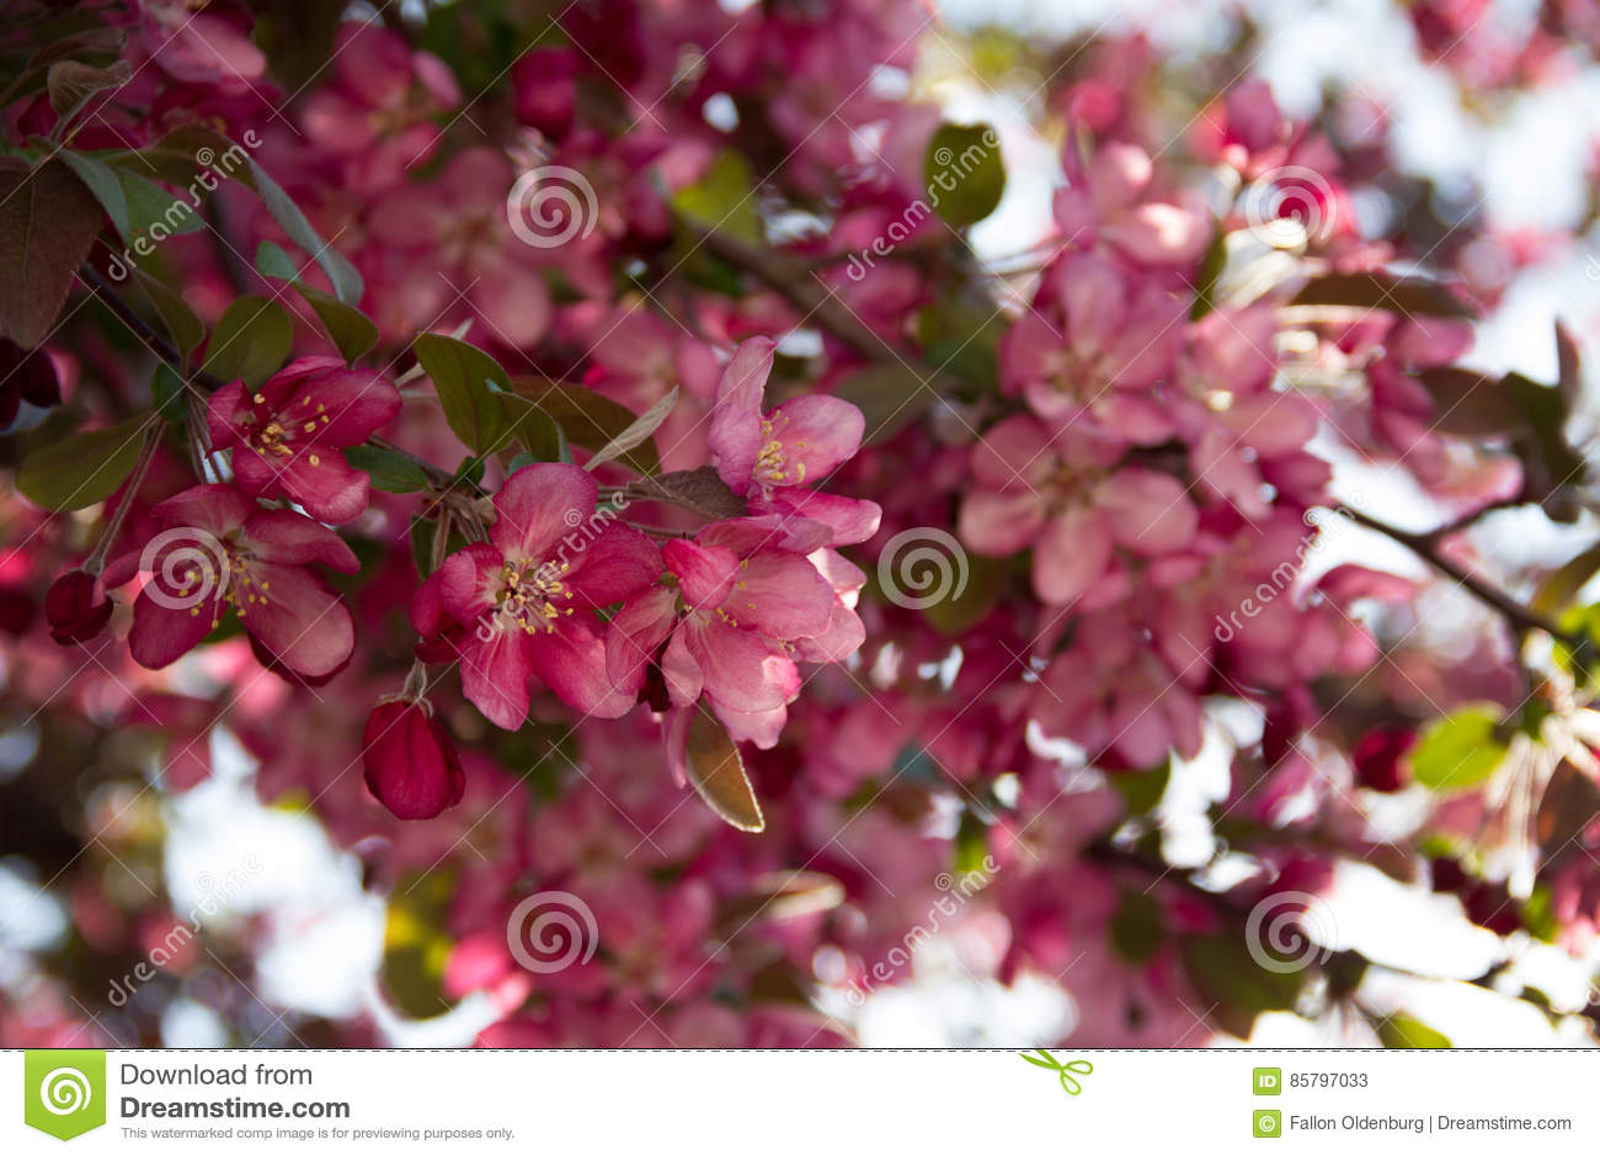 blommande träd bilder